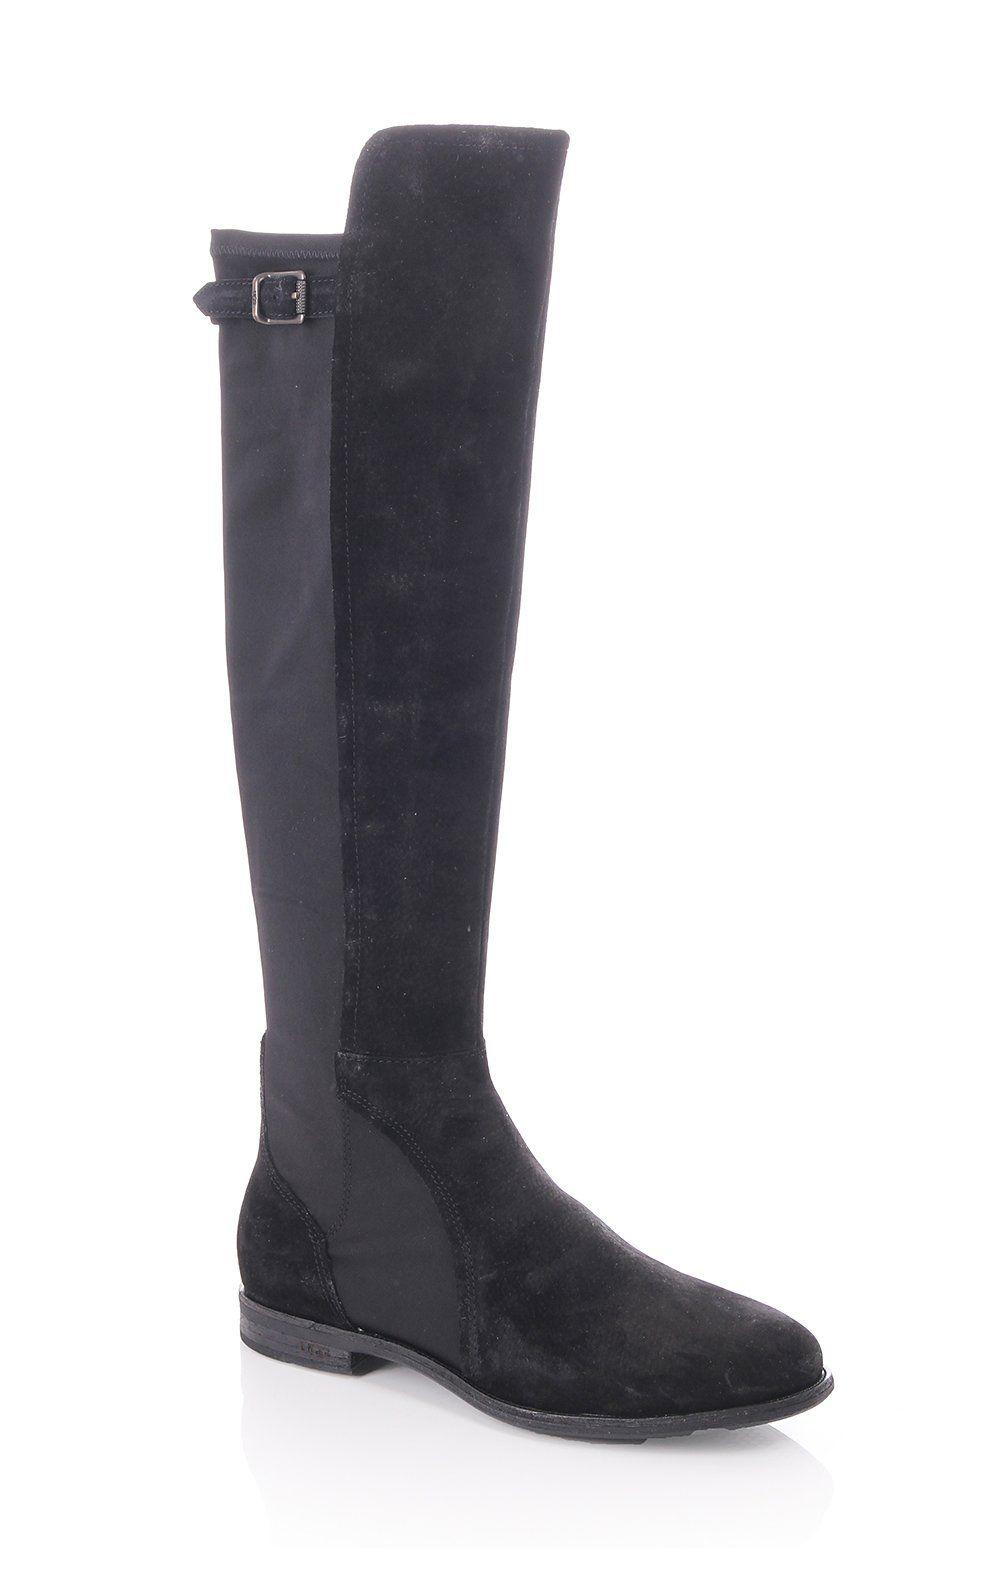 Ugg Australia Danae Stretch Knee High Suede Boot Black